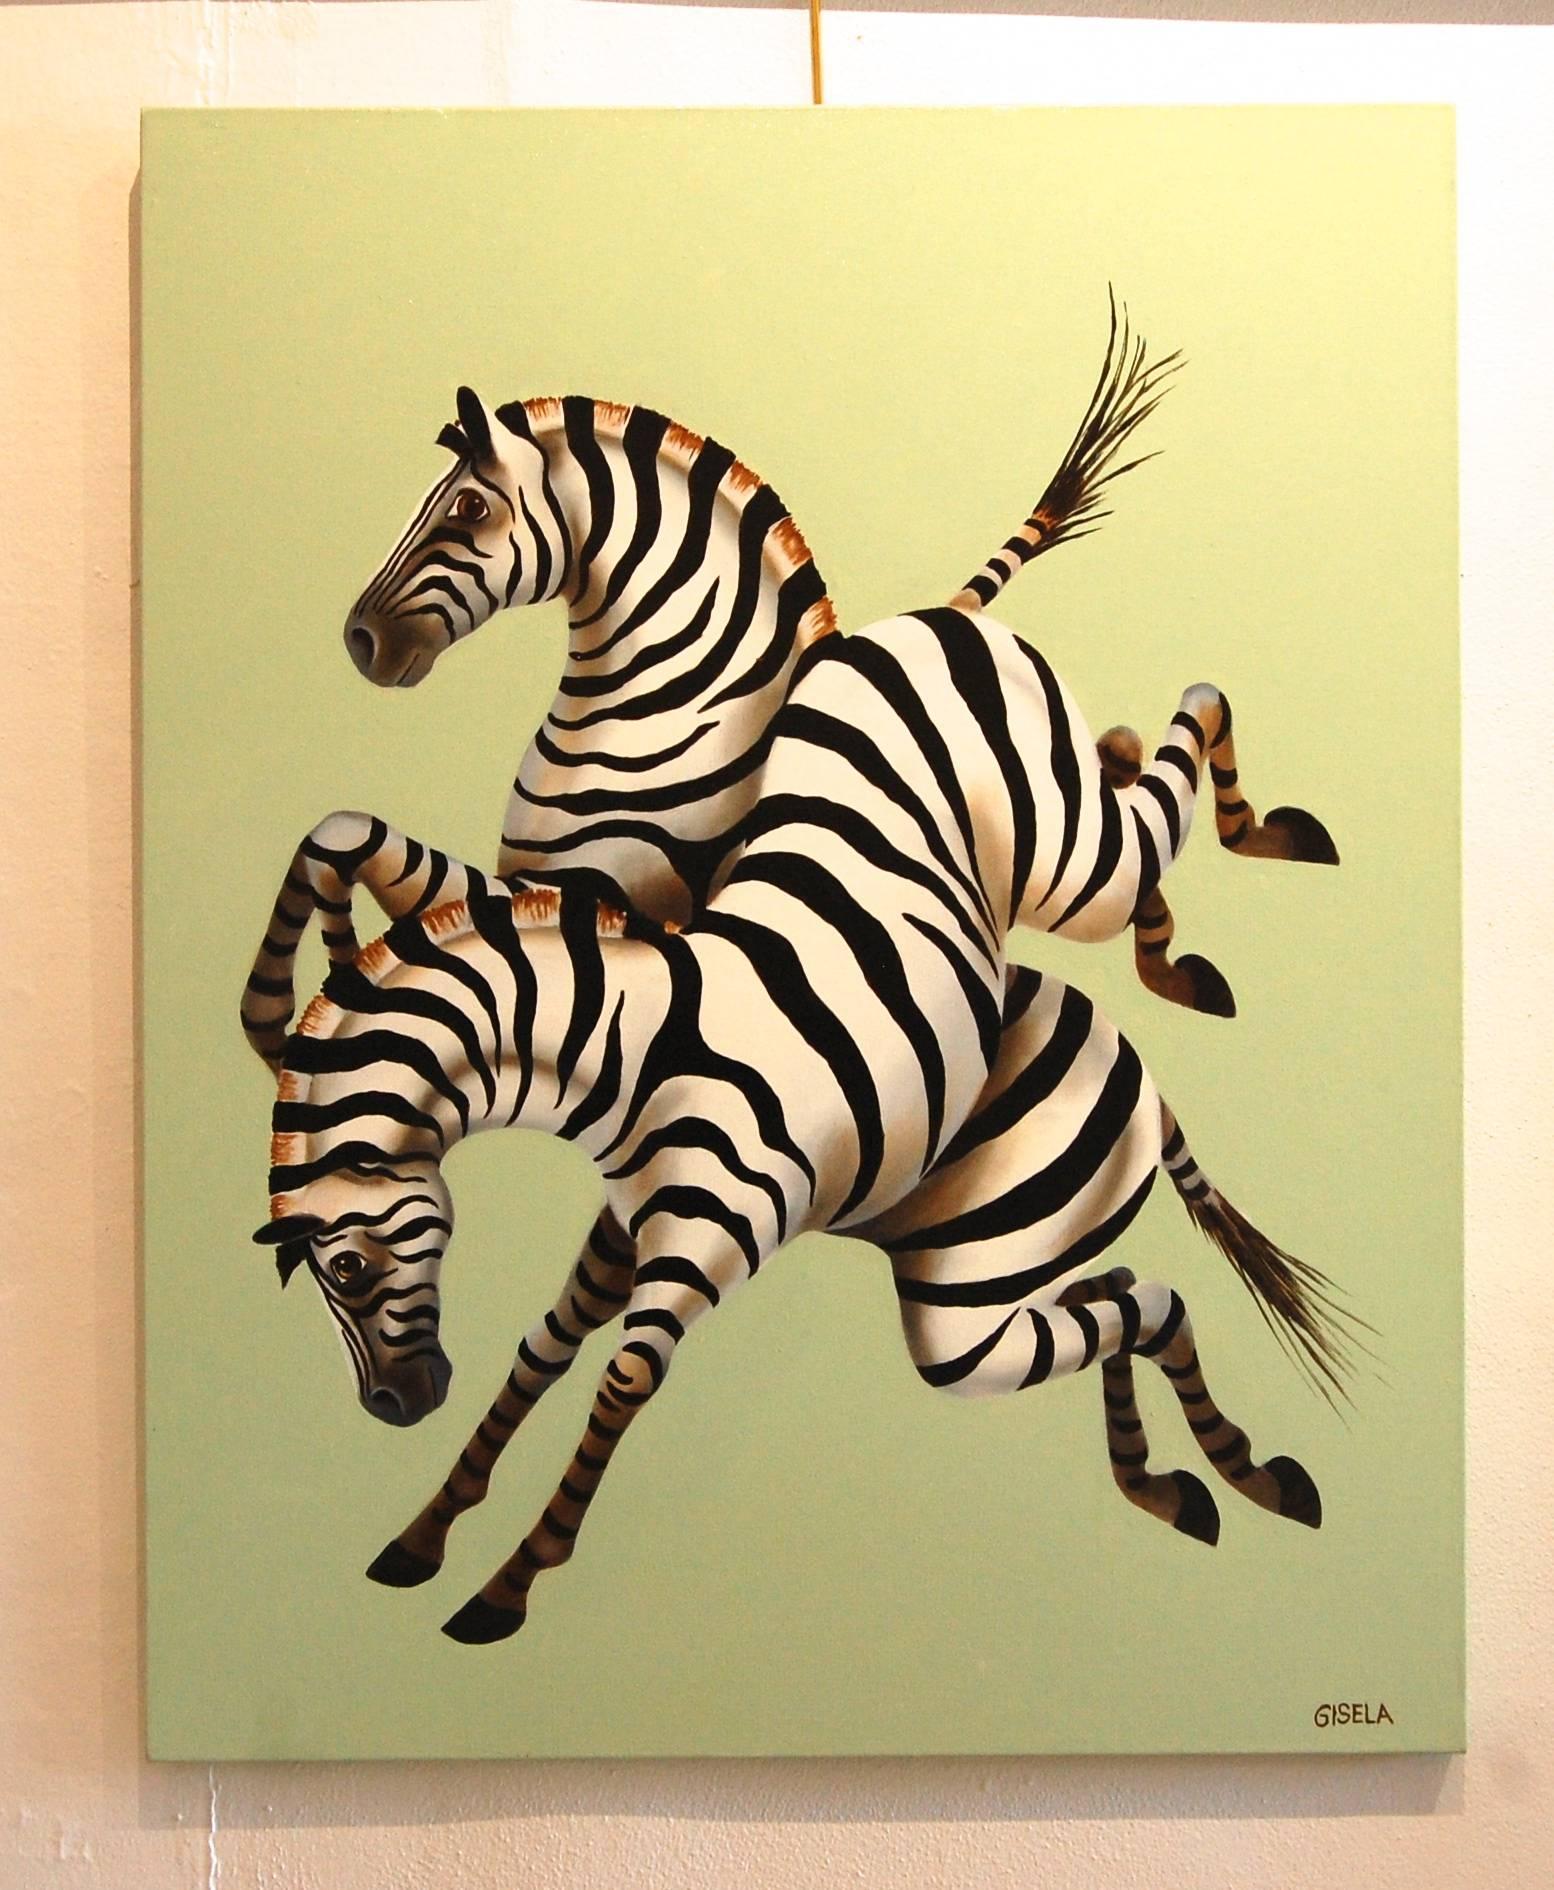 Gisela Pferdekamper - Happy Zebras, Painting For Sale at 1stdibs